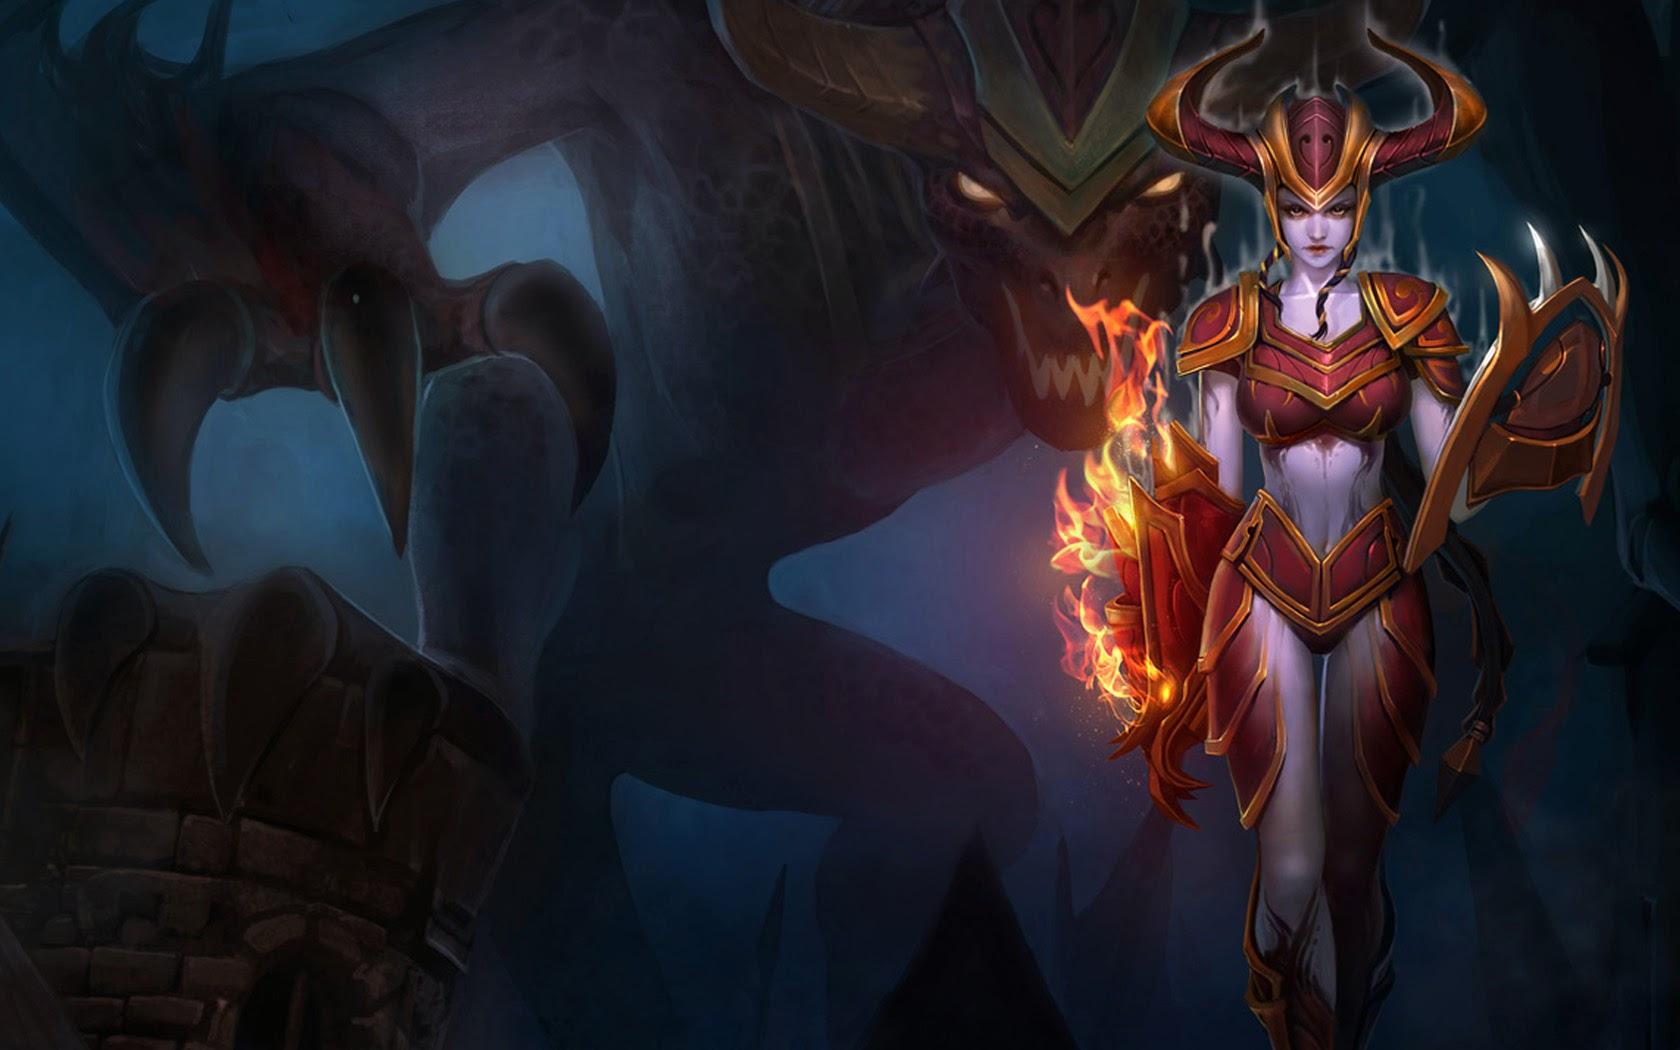 Free Download Dragon League Of Legends Lol Girl Champion Hd